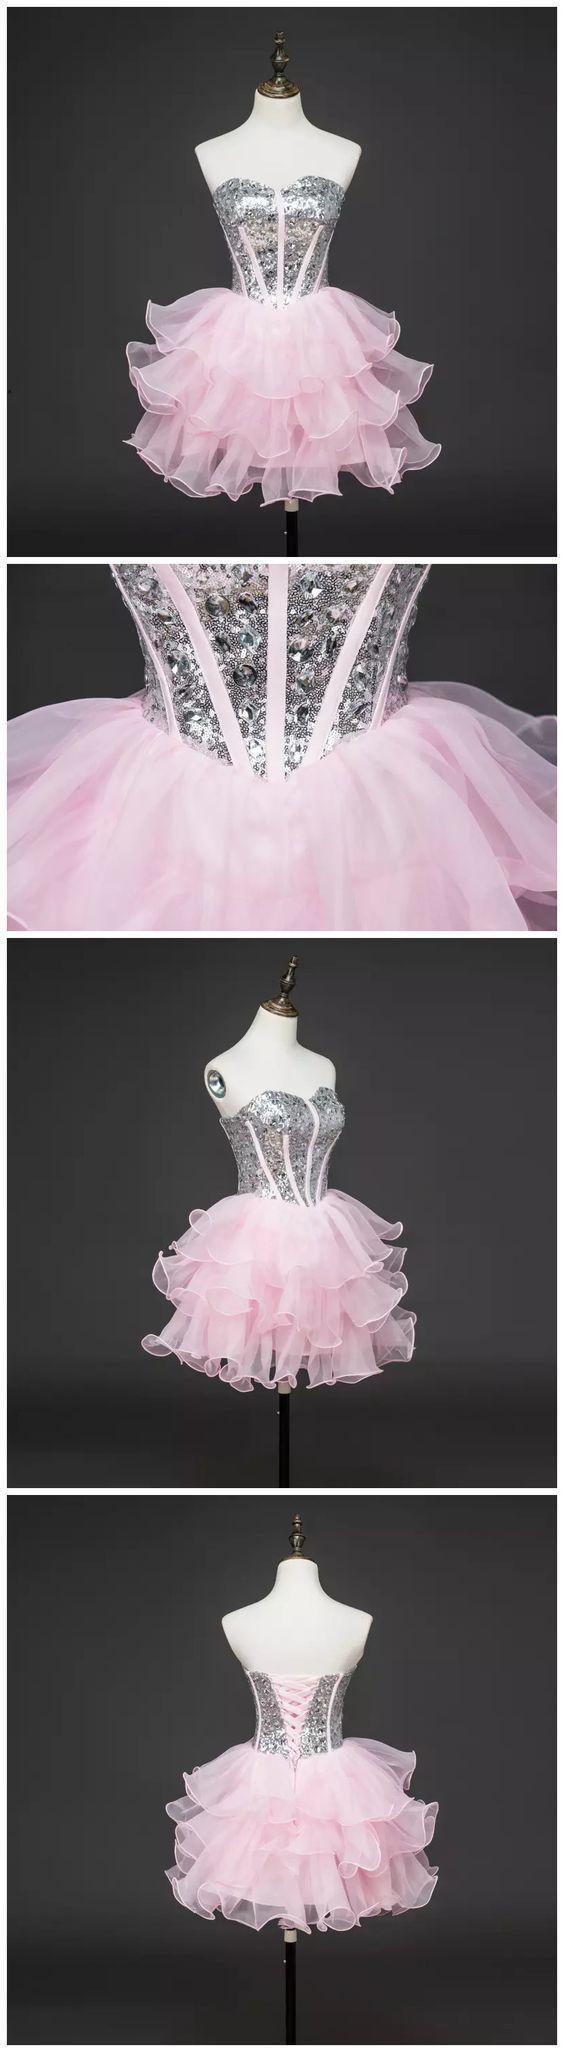 Aline sweetheart short mini tulle short prom dress homecoming